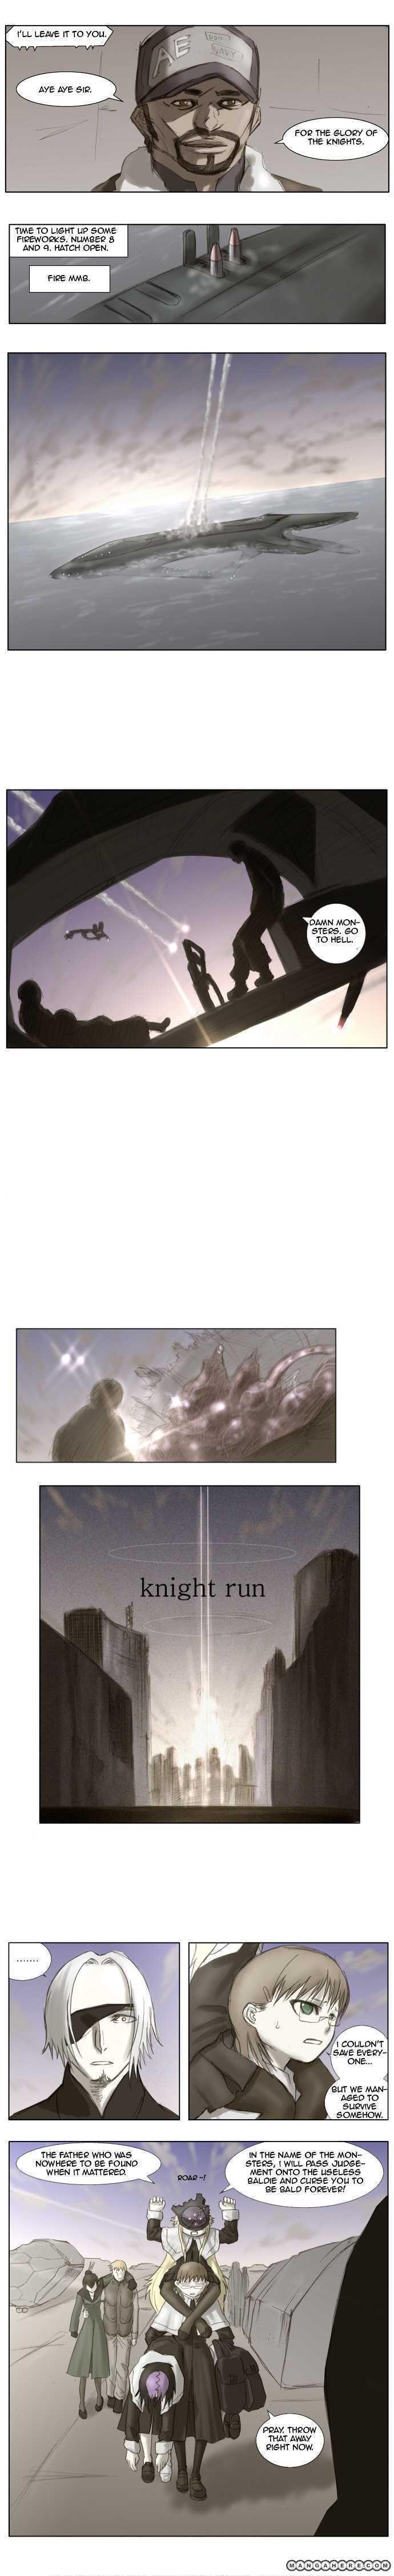 Knight Run 5 Page 3